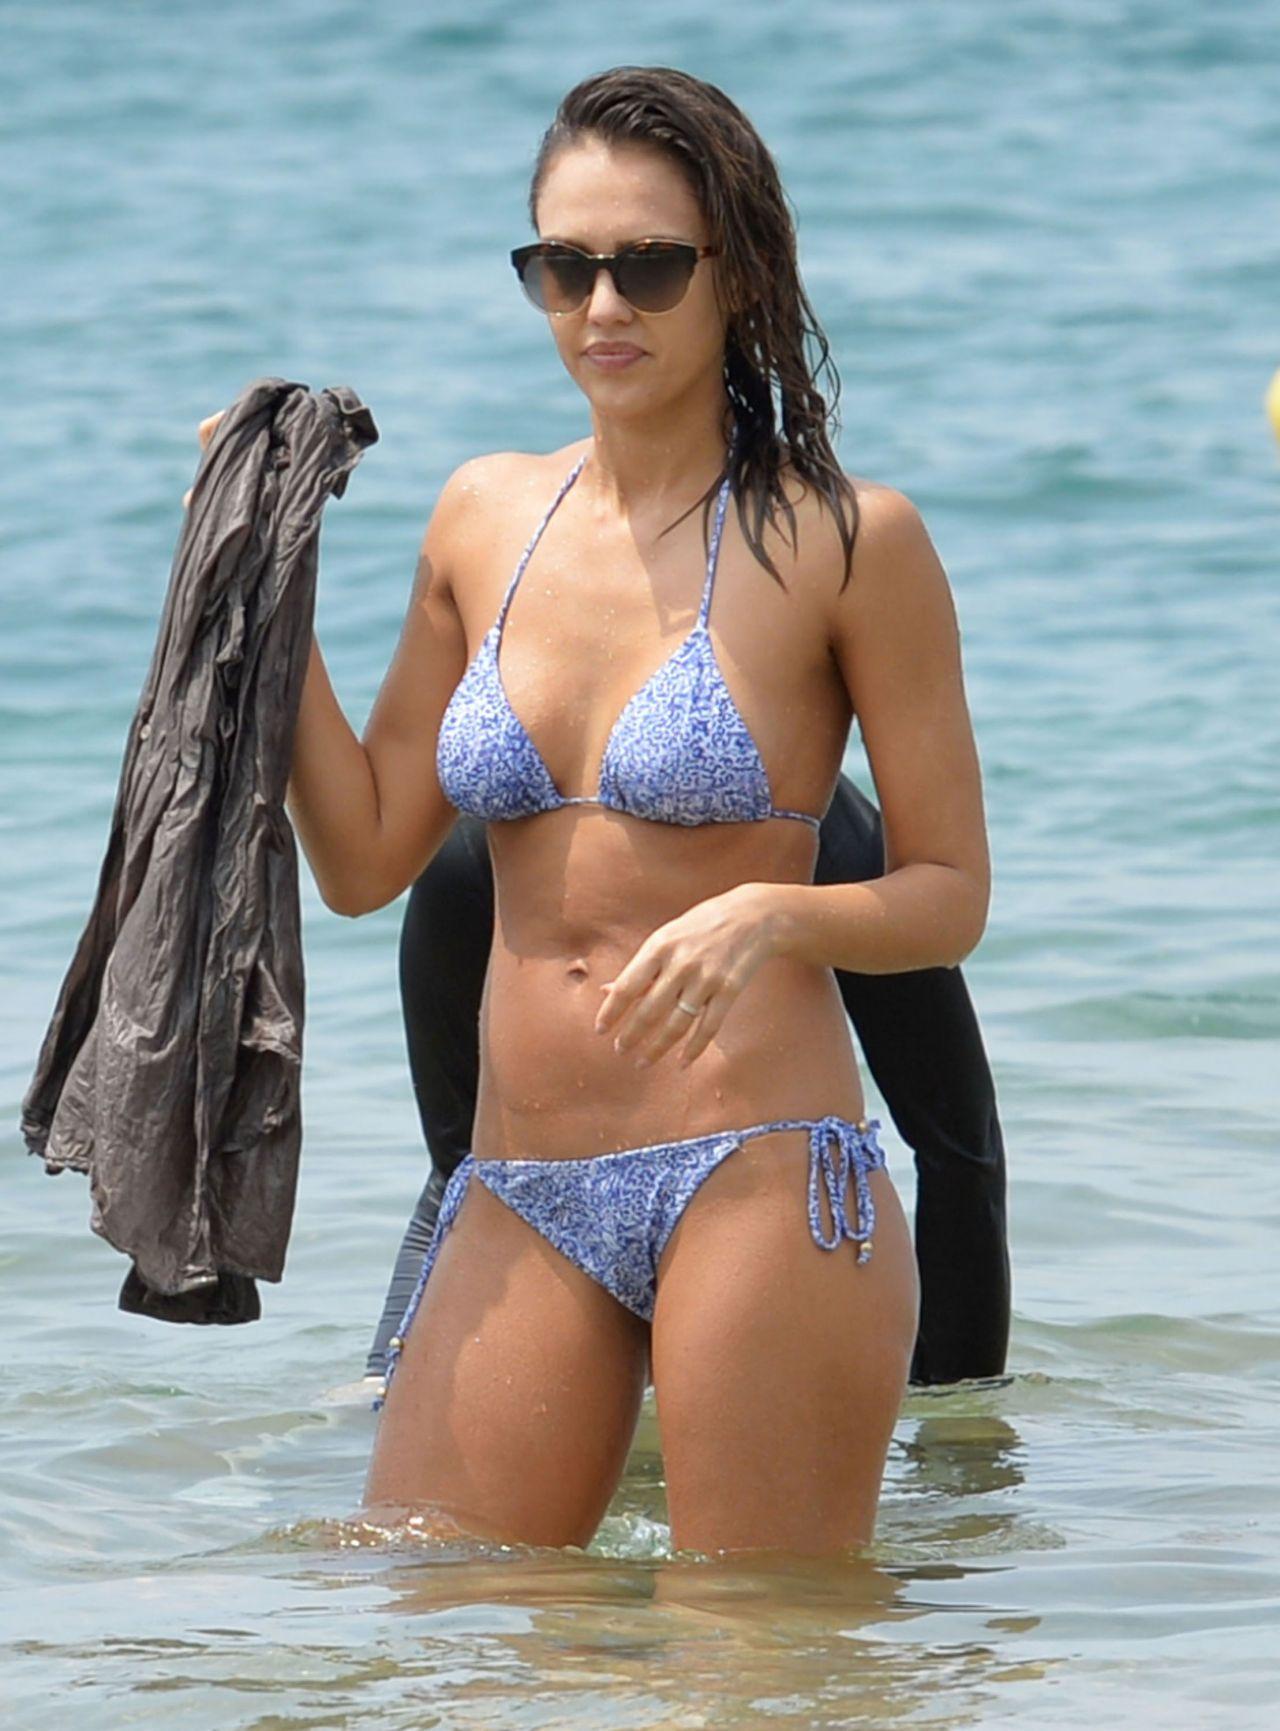 Jessica Alba Hot In Bikini - At The Beach In Hawaii, 3222016-3036